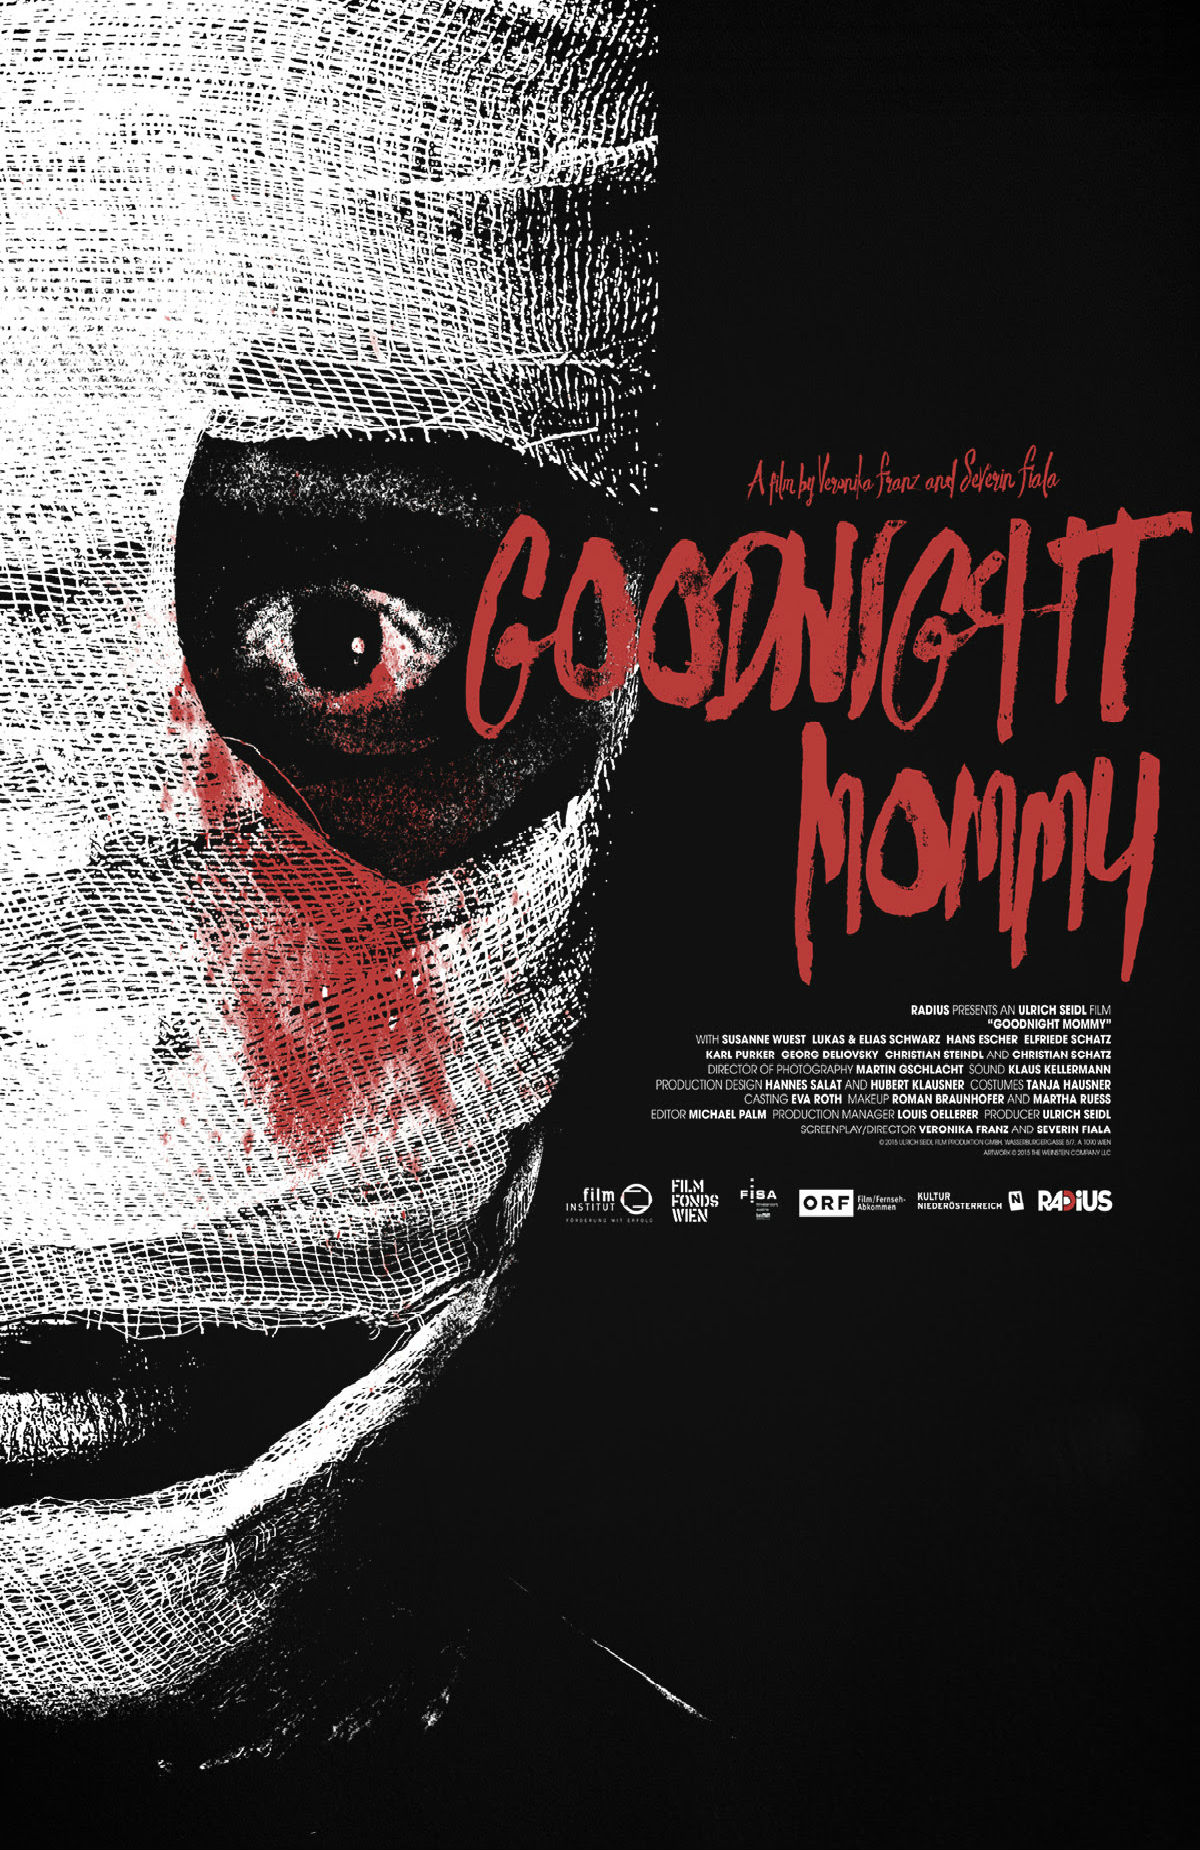 171 - Goodnight Mommy 2019 - Chúc Mẹ Ngủ Ngon